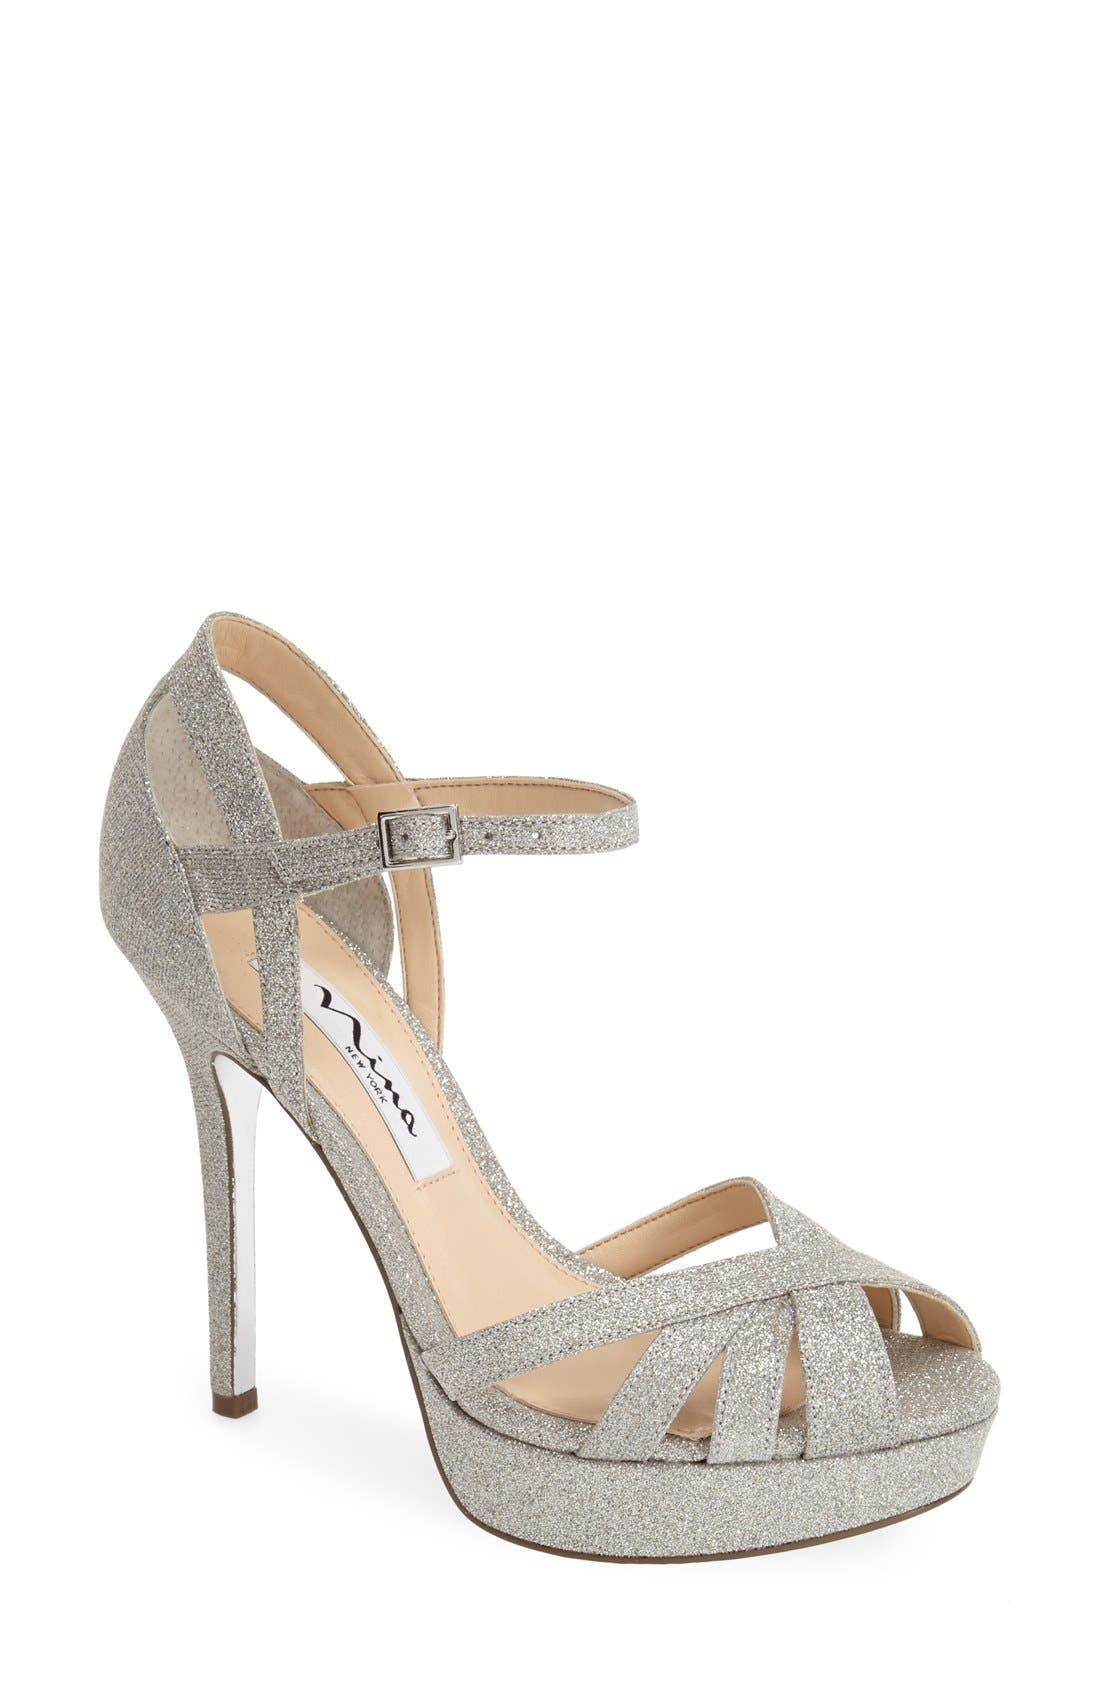 NINA 'Senora' Glitter Satin Sandal, Main, color, 042